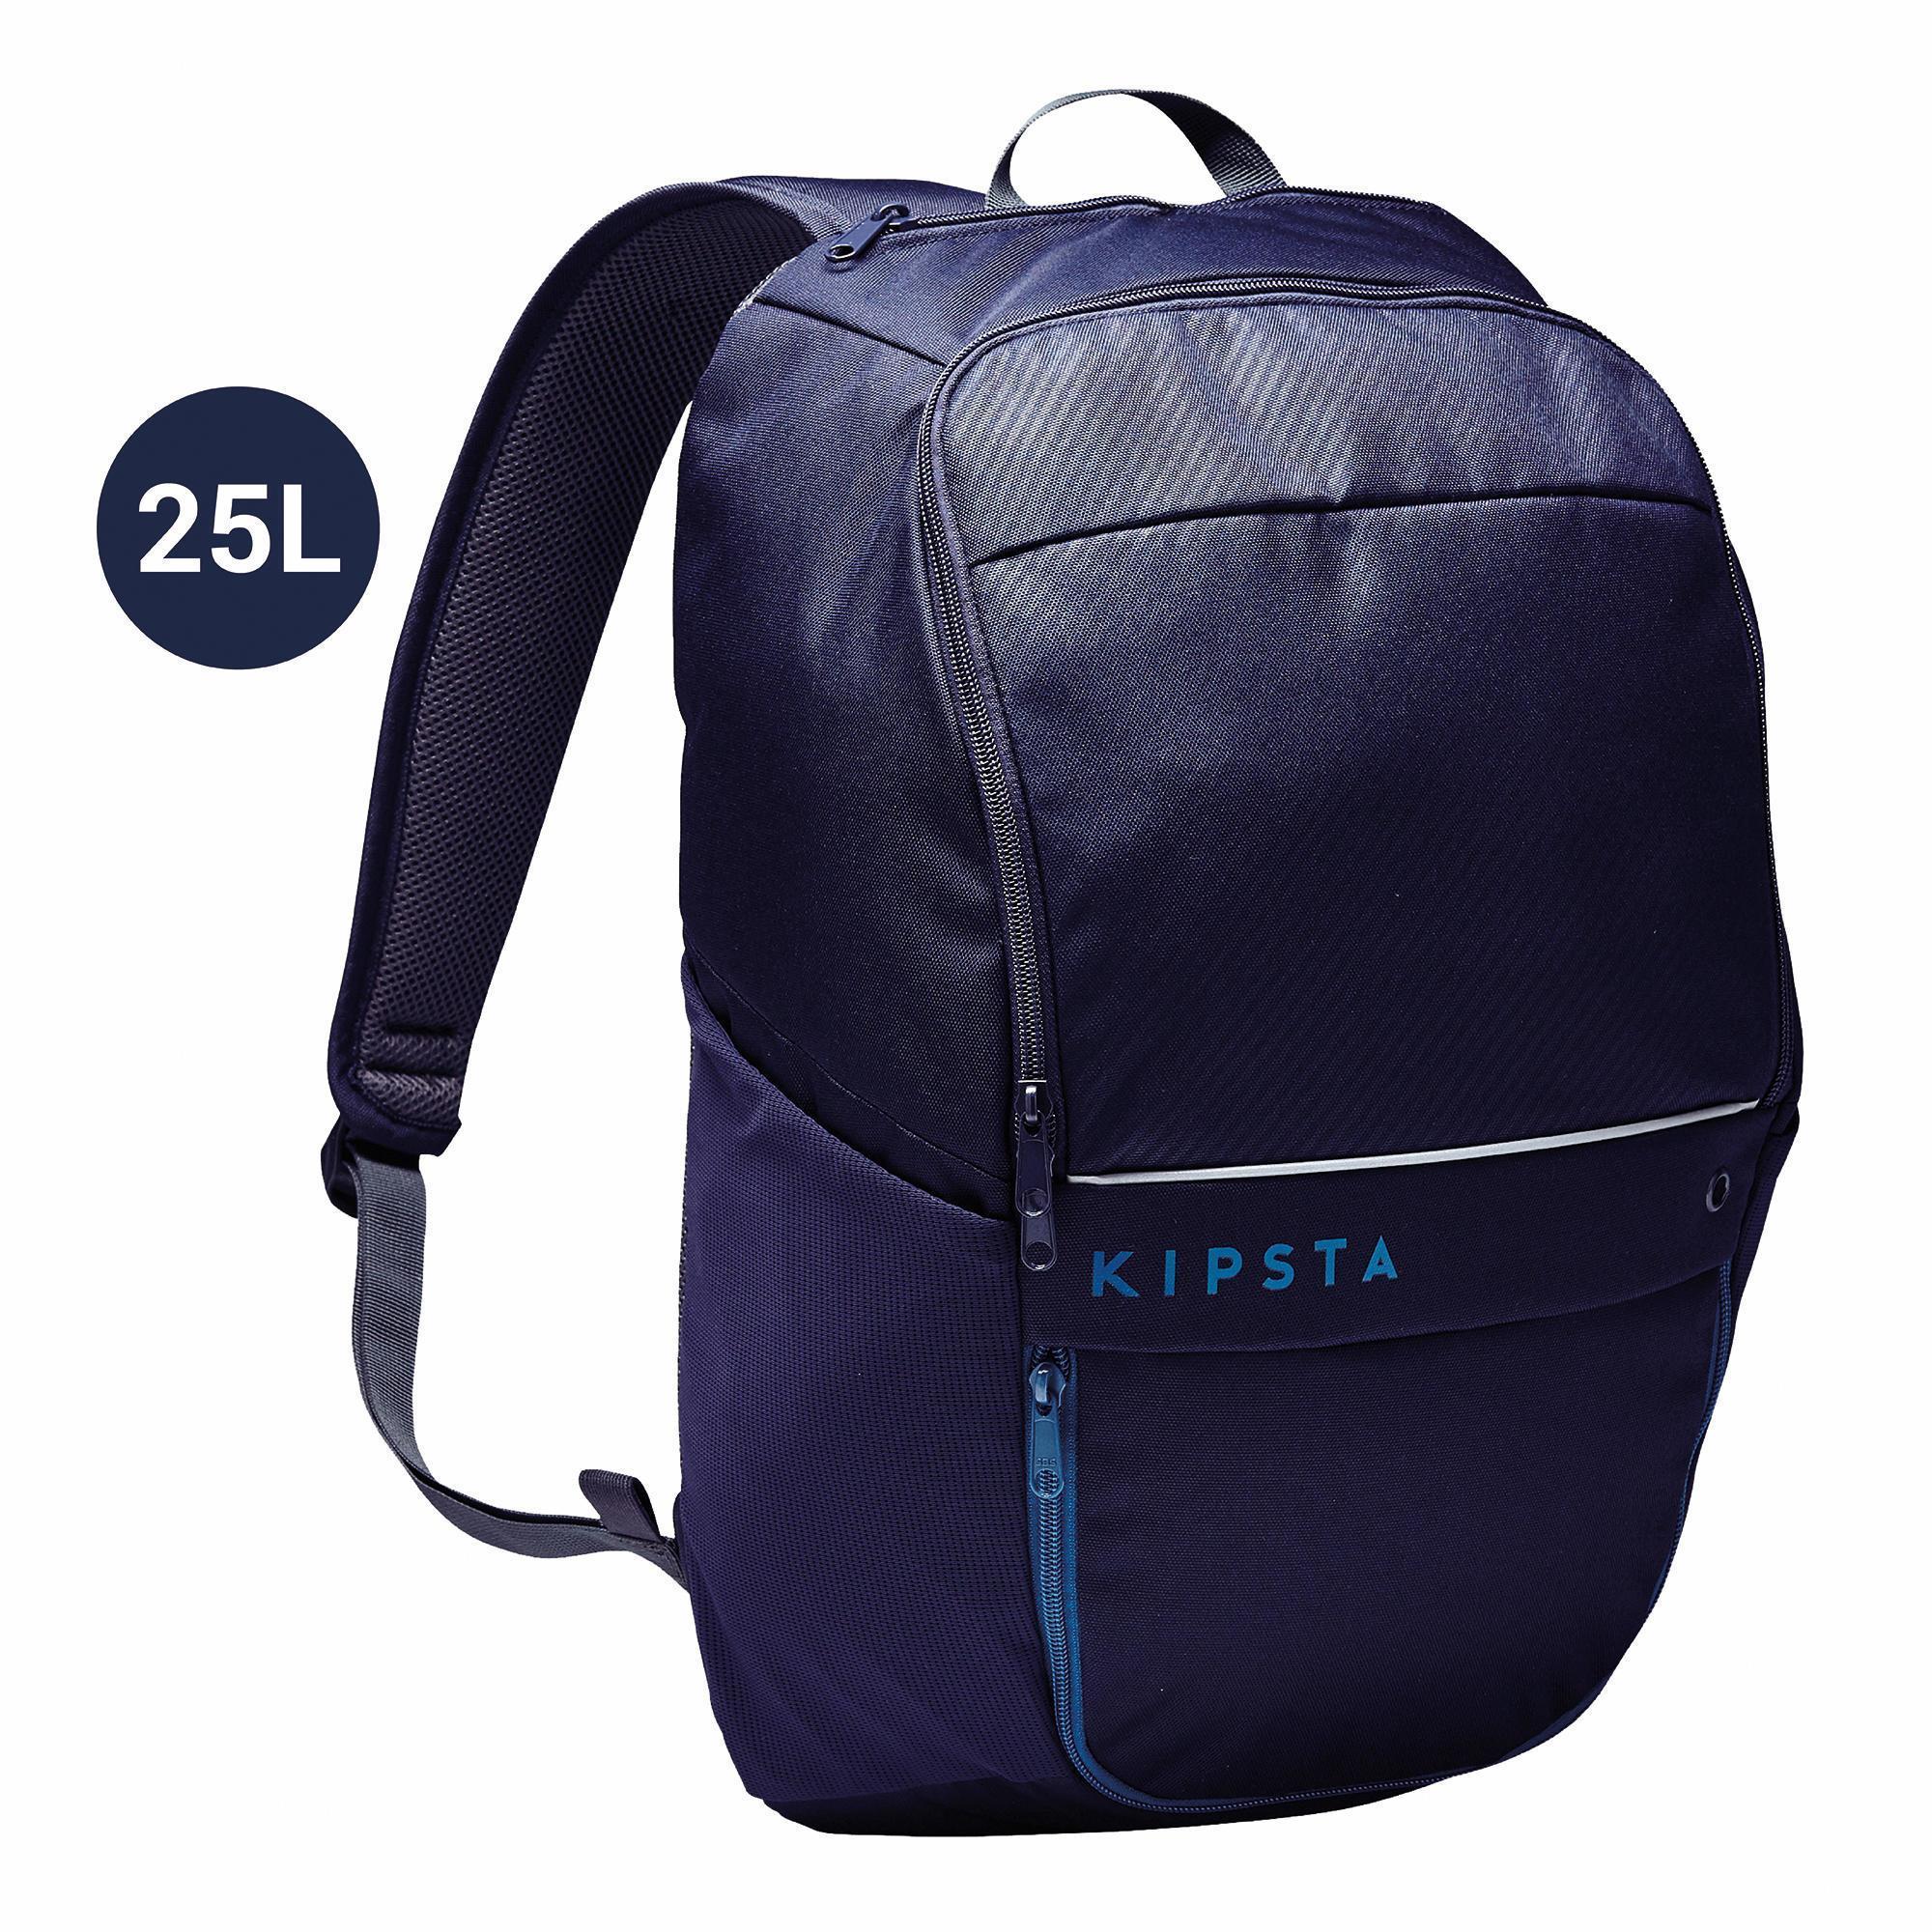 Sporttasche Rucksack Classic 25 Liter blau